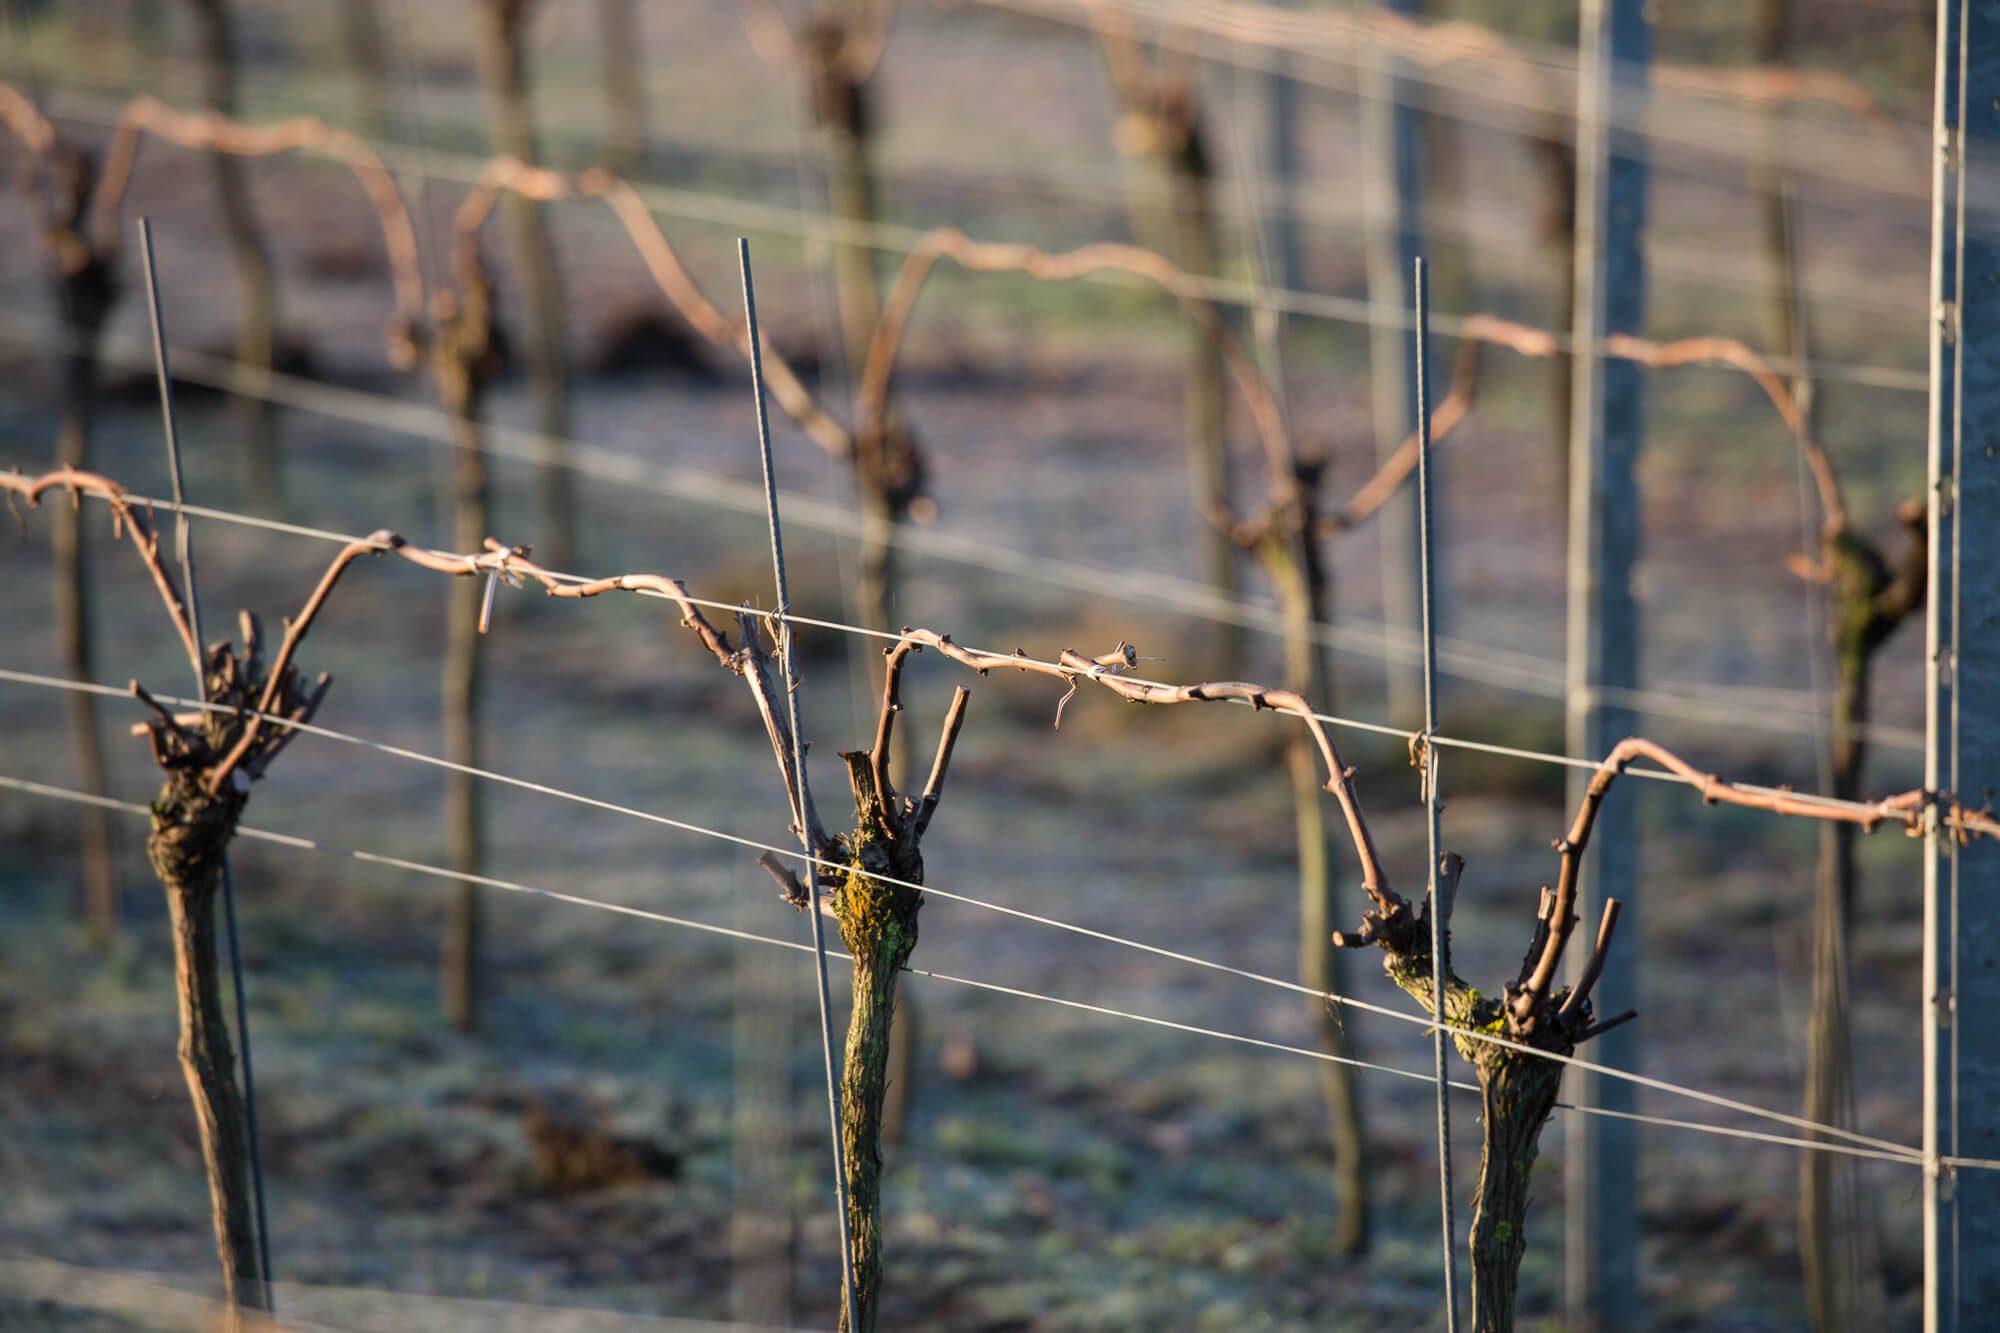 Pruned Vines